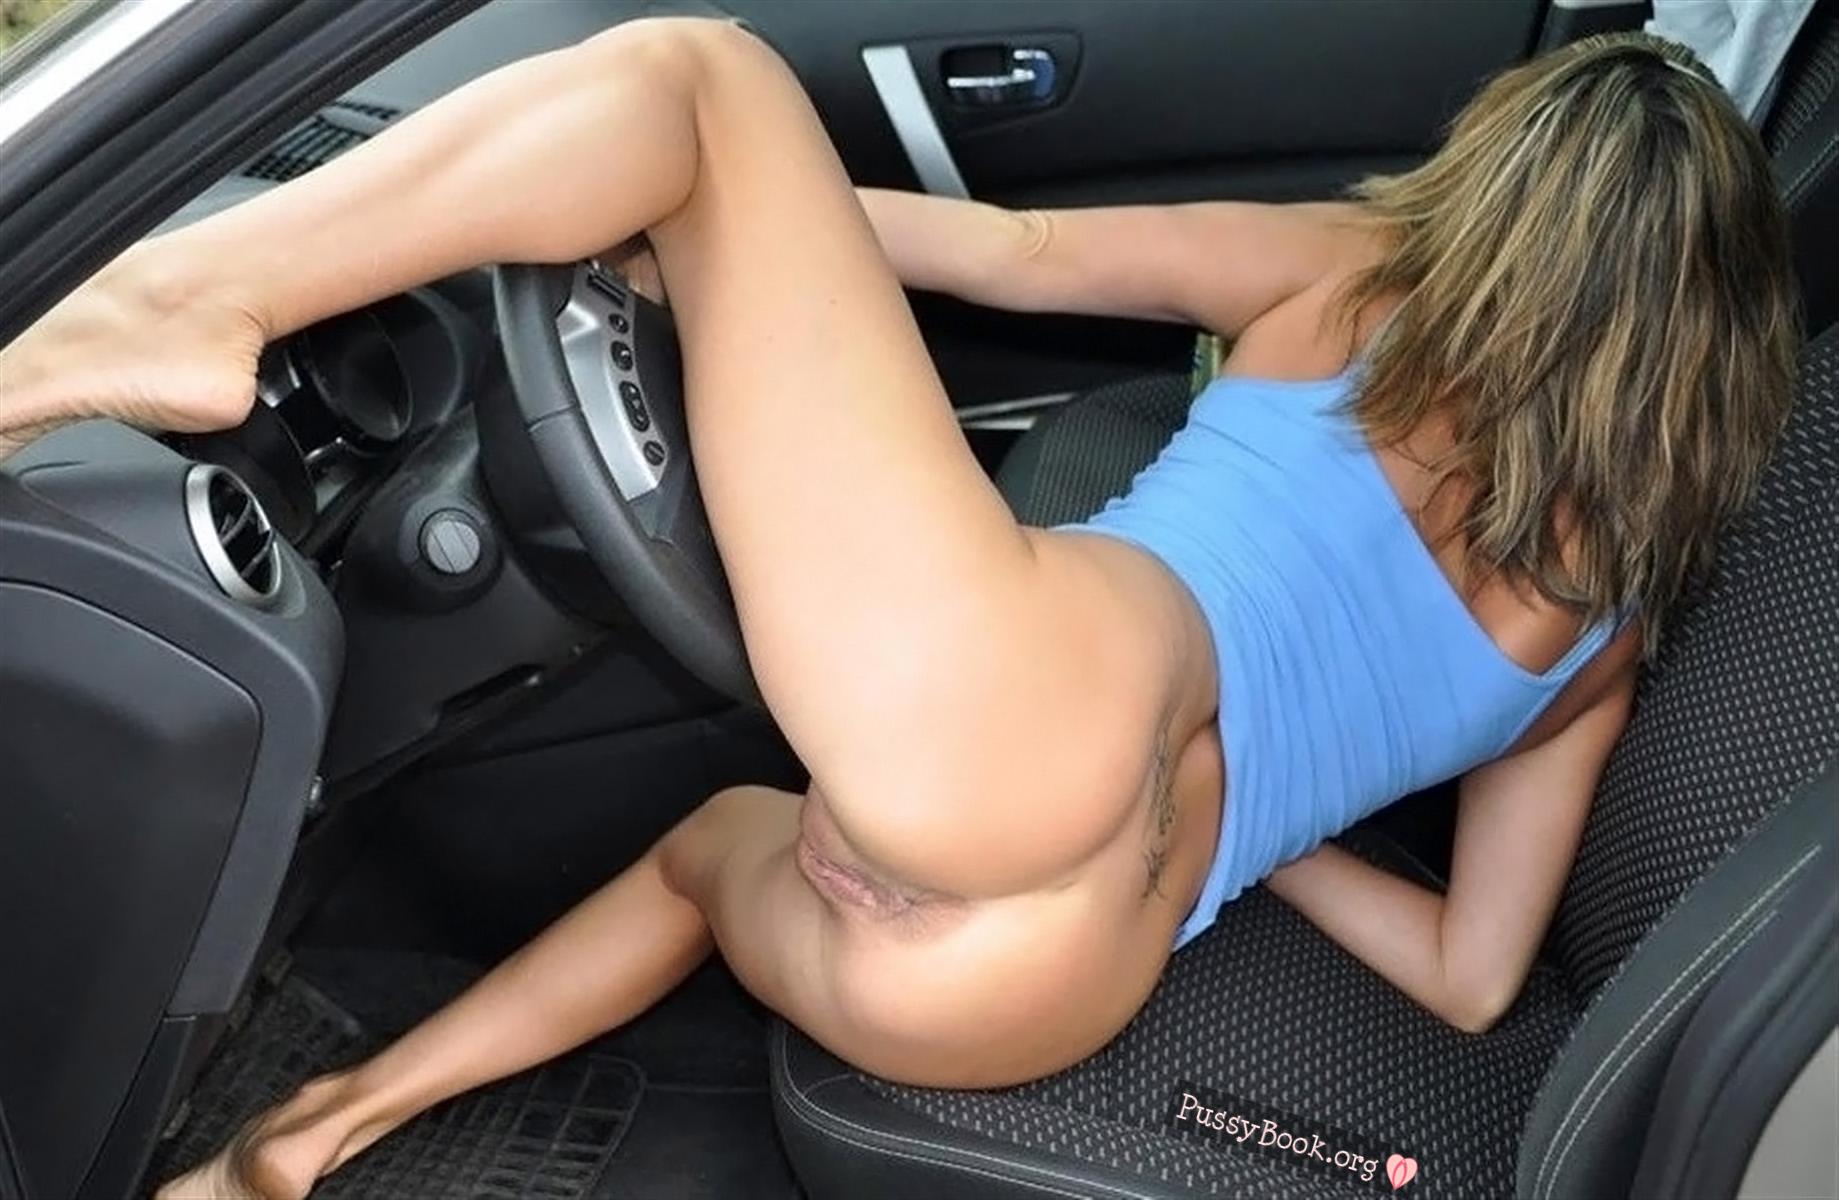 Hot naked fantasy girl erotic clips